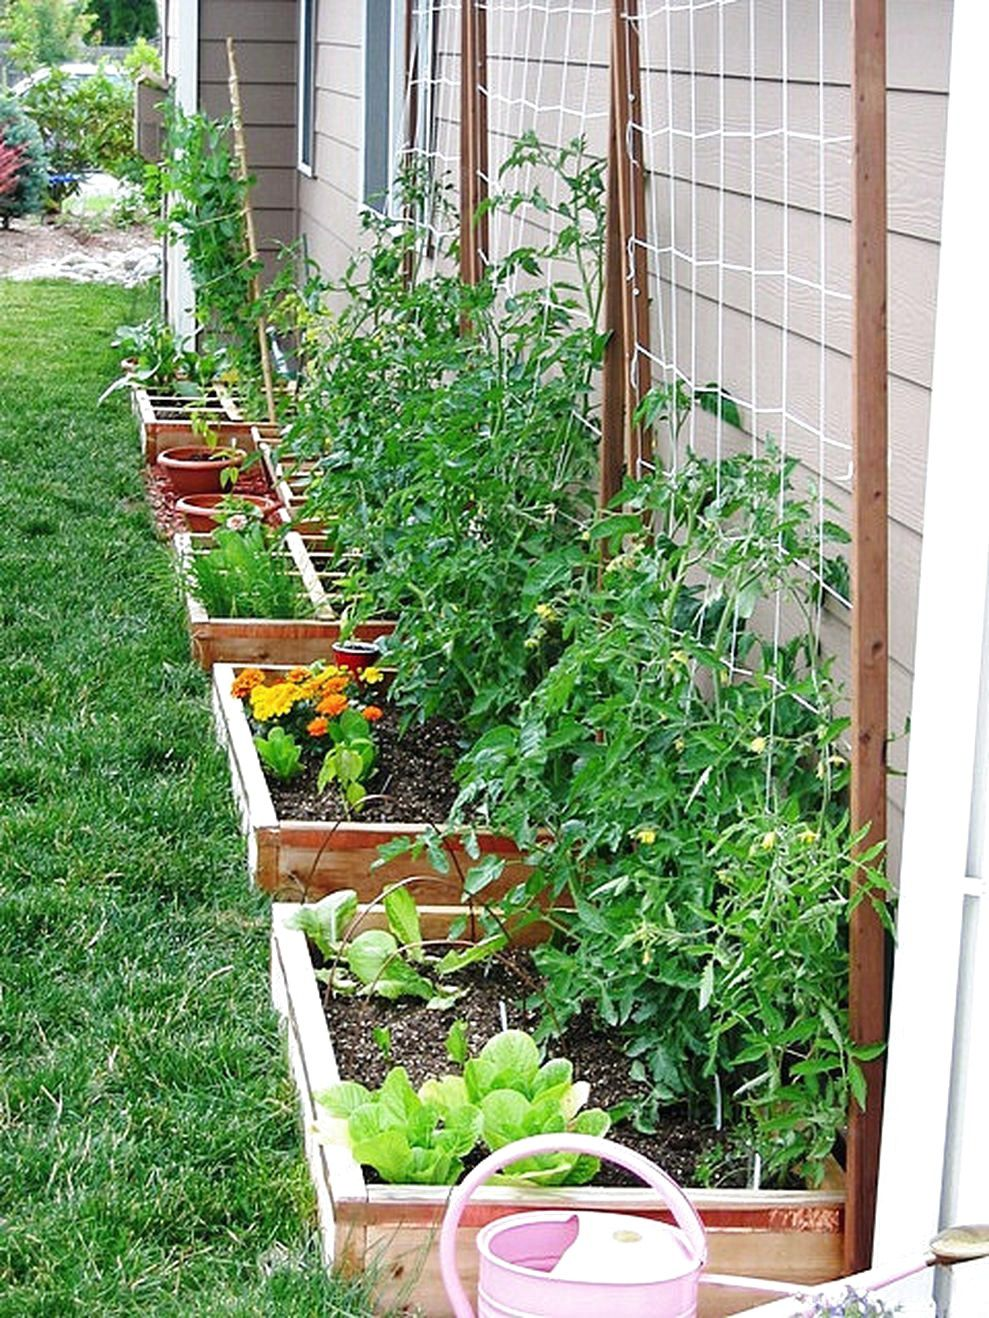 45 Best Backyard Vegetable Garden Designs Ideas Home Garden Vegetable Garden Design Backyard Vegetable Gardens Small Garden Design